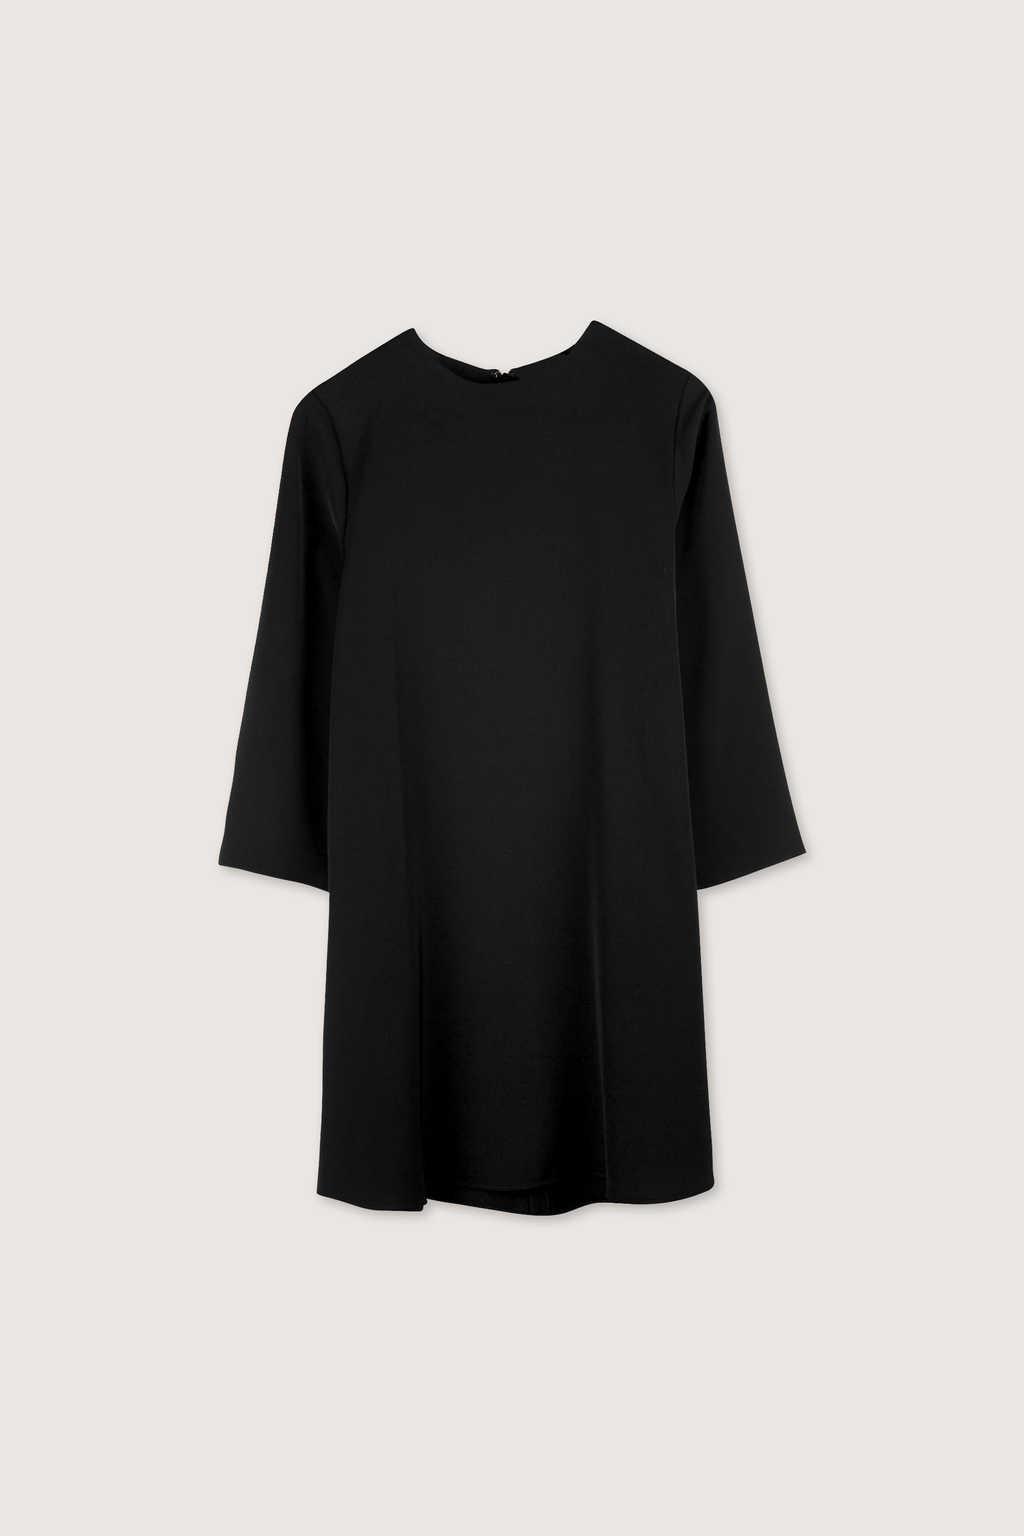 Dress 1649 Black 7